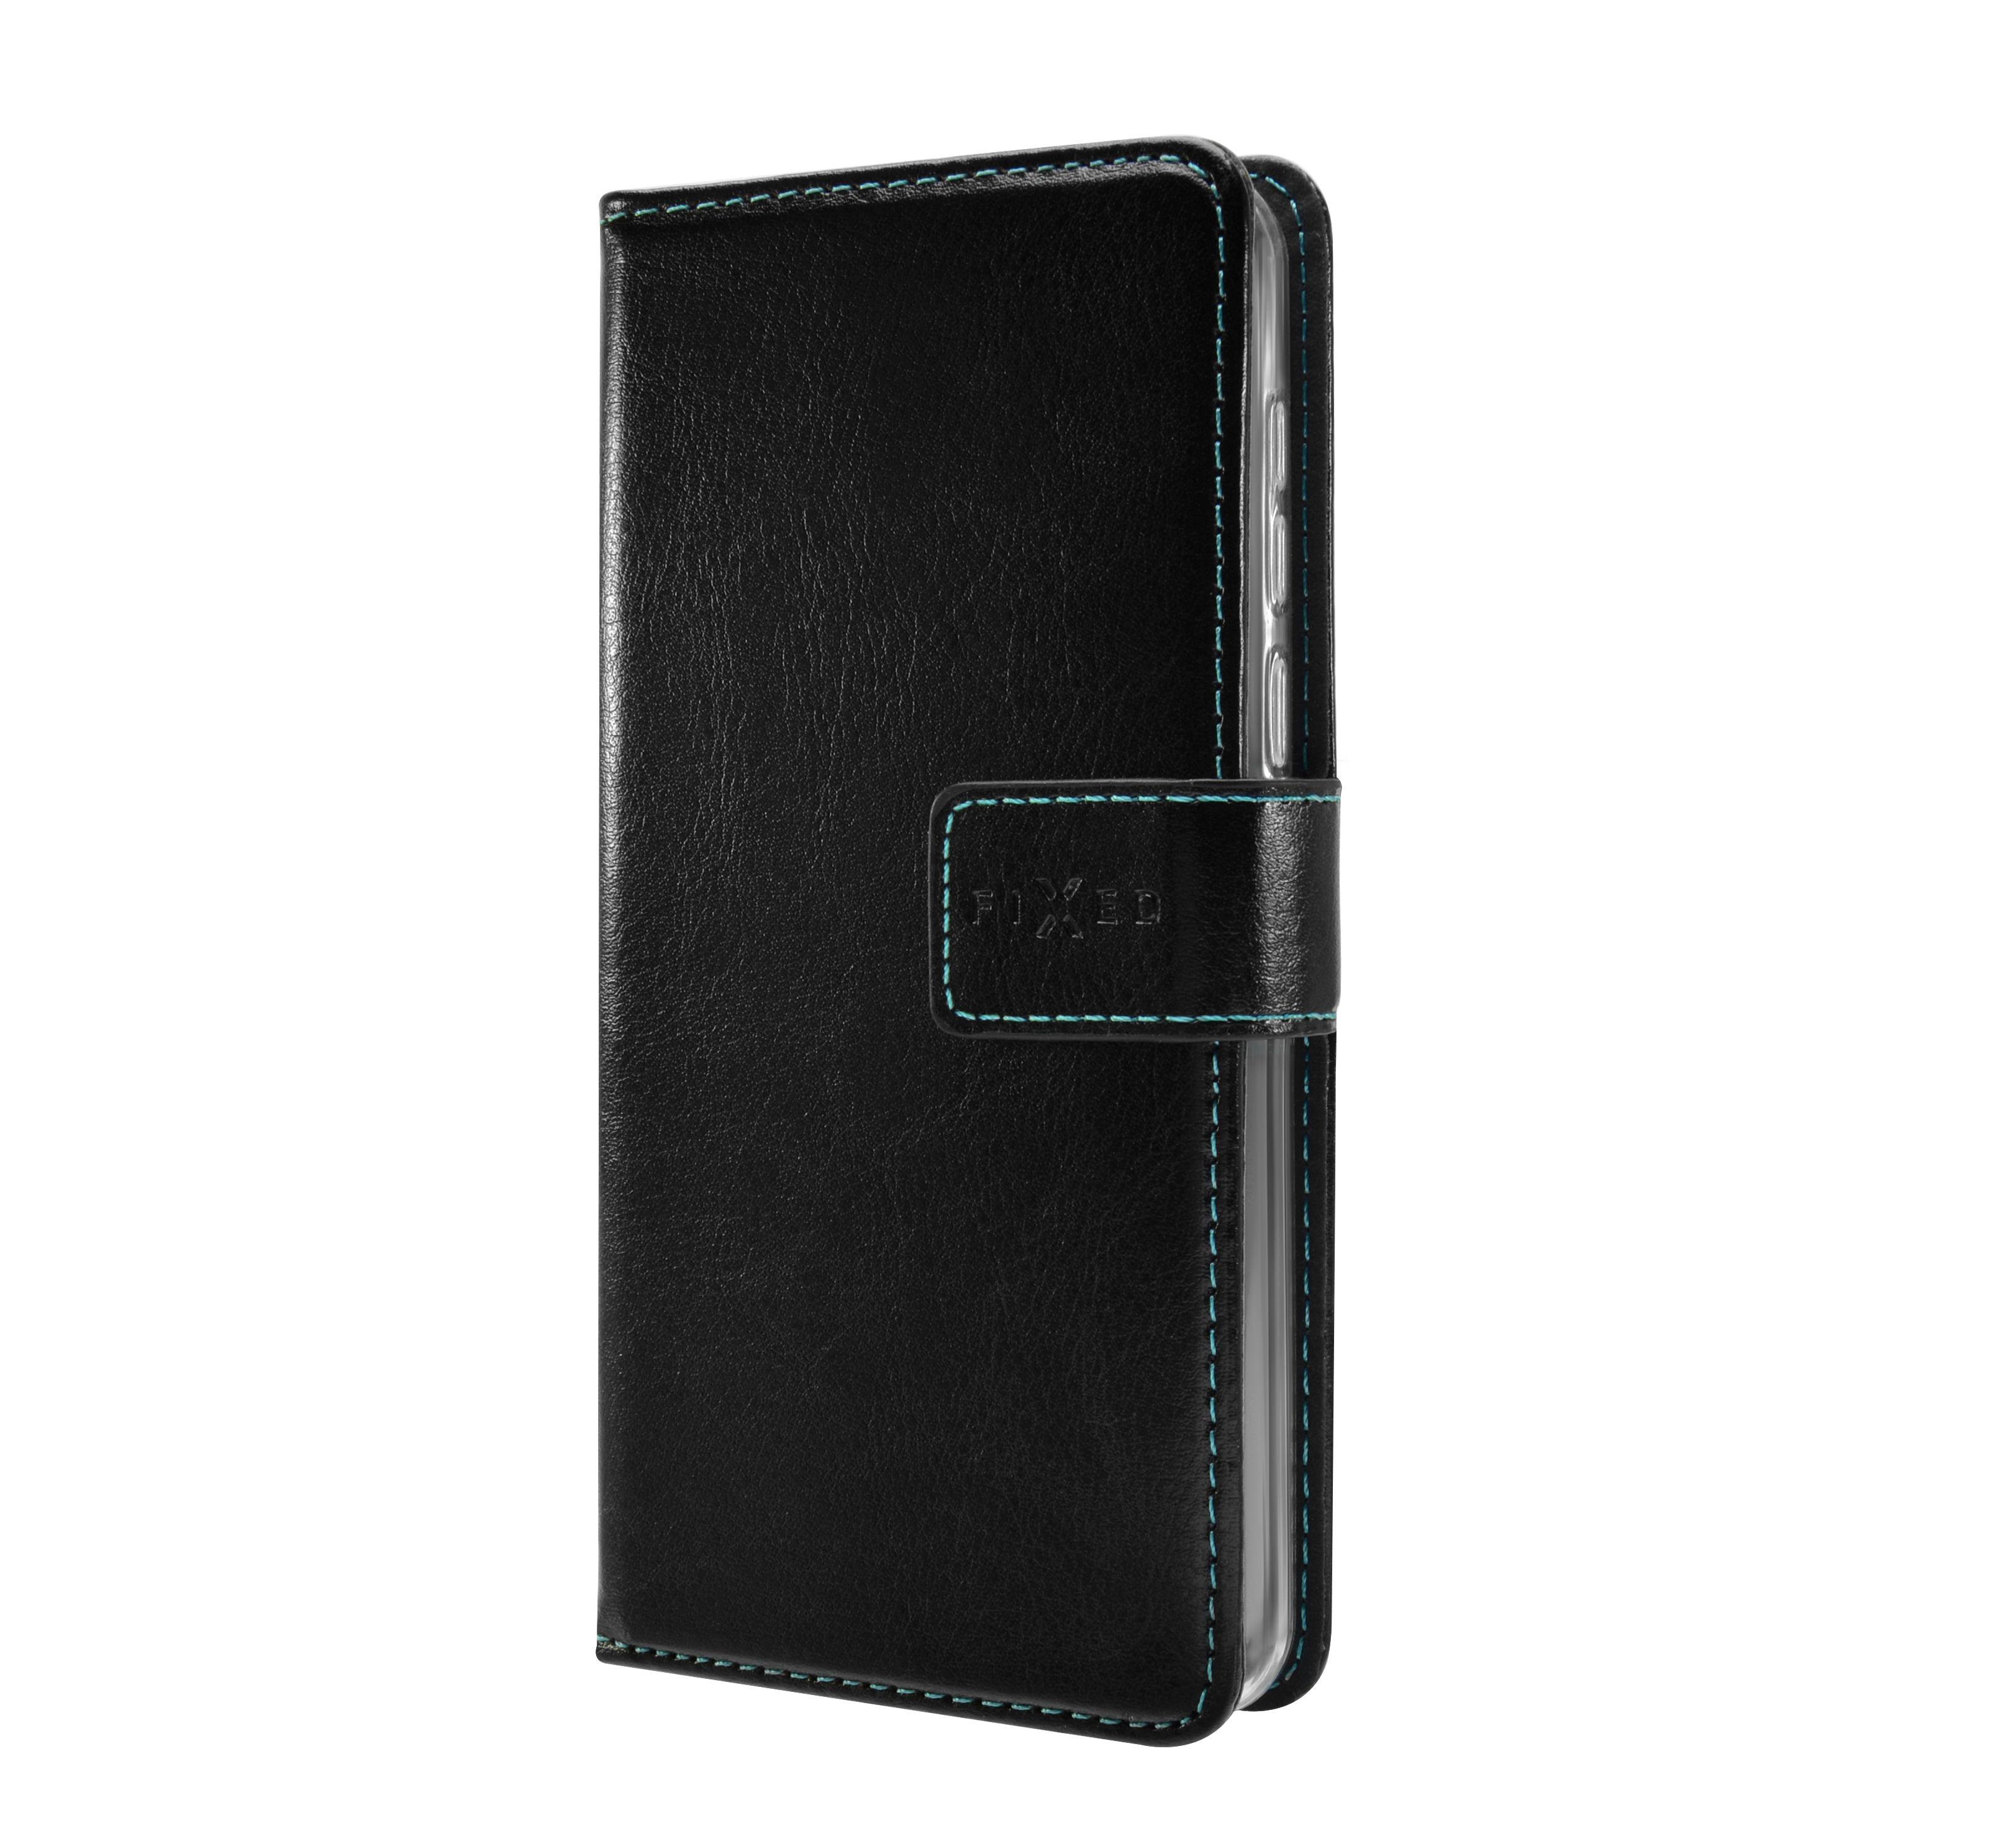 Pouzdro typu kniha FIXED Opus pro Xiaomi Redmi 8, černé